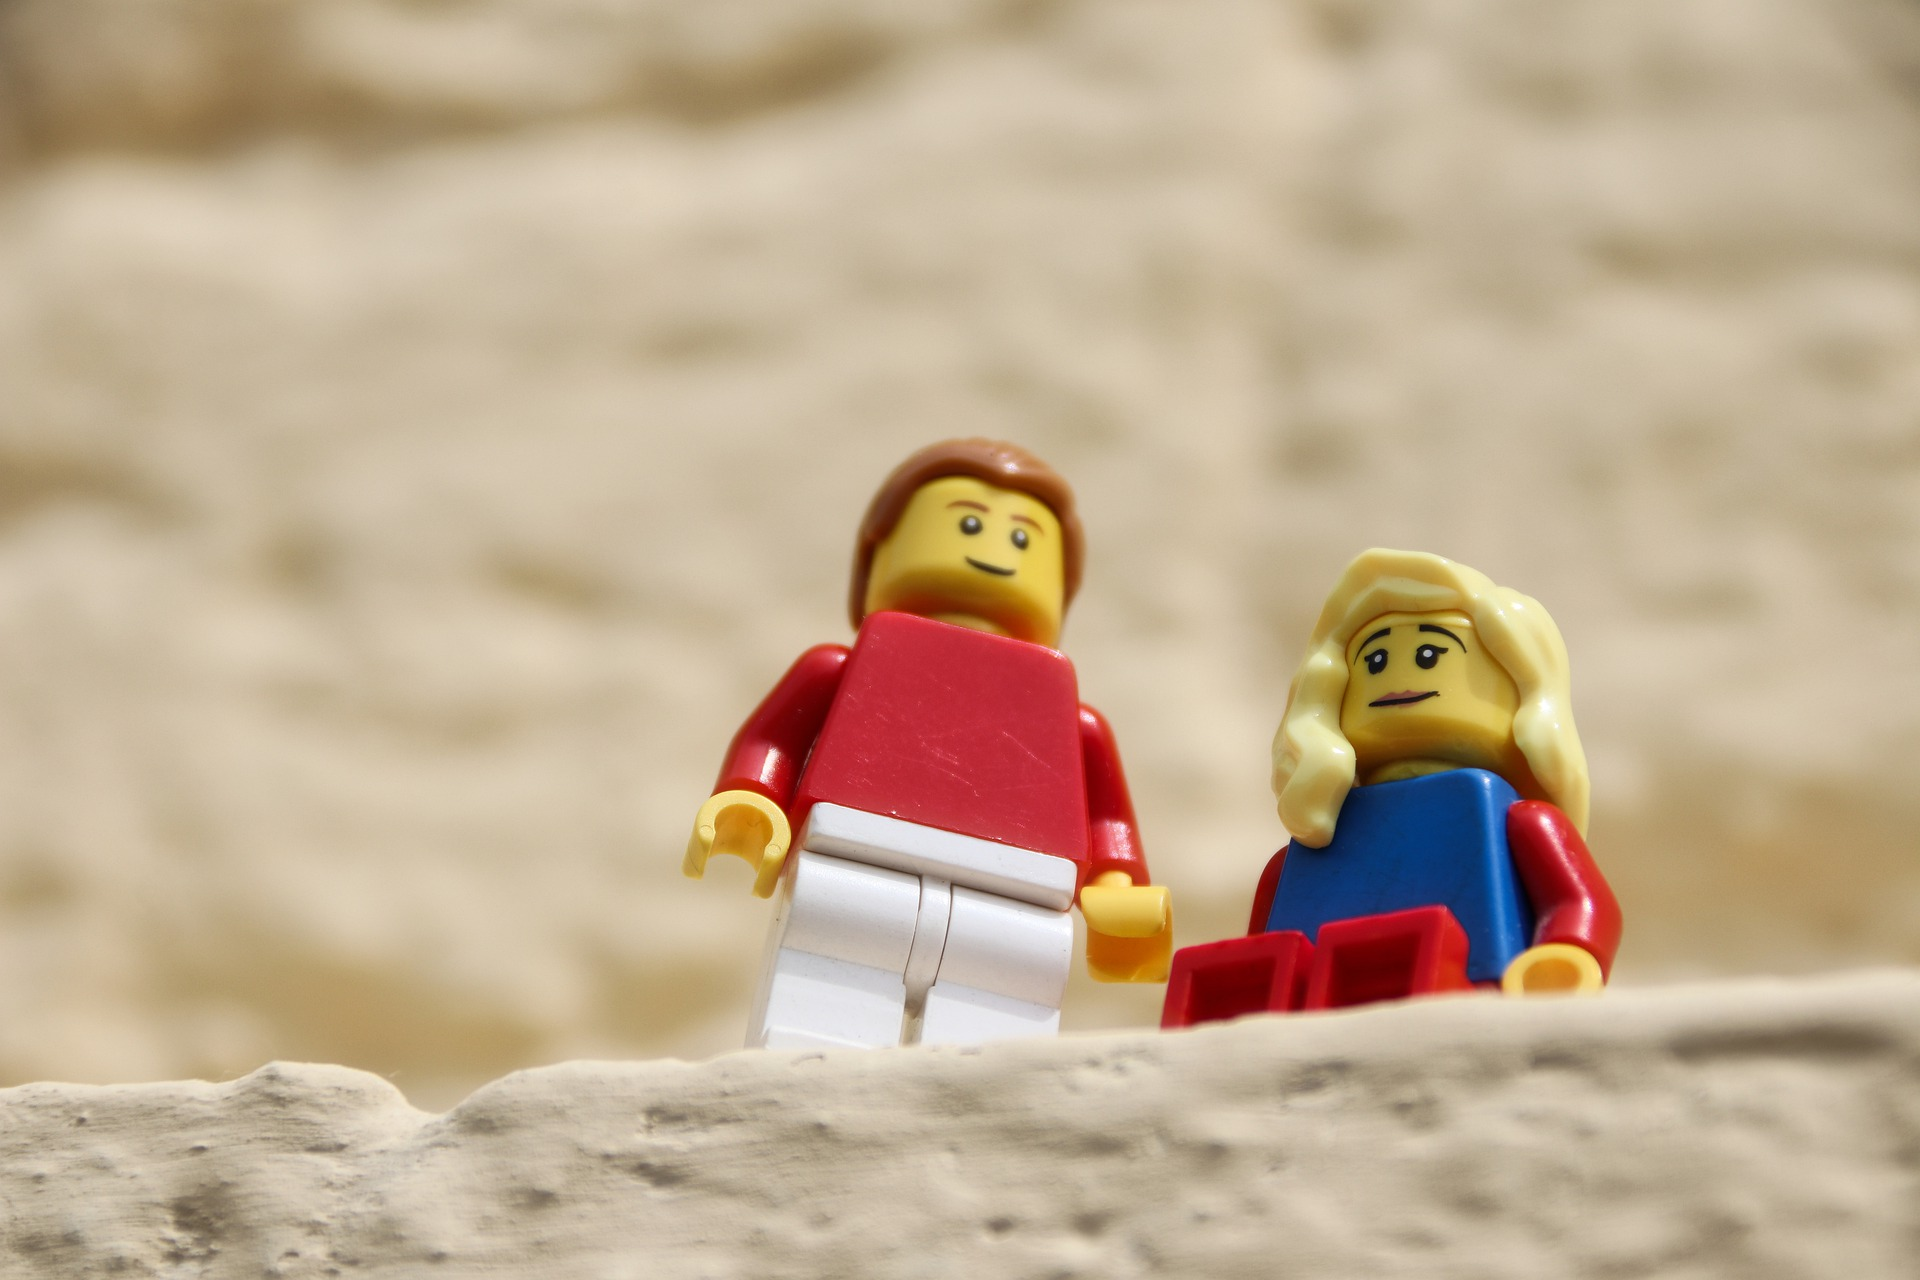 couple-lego